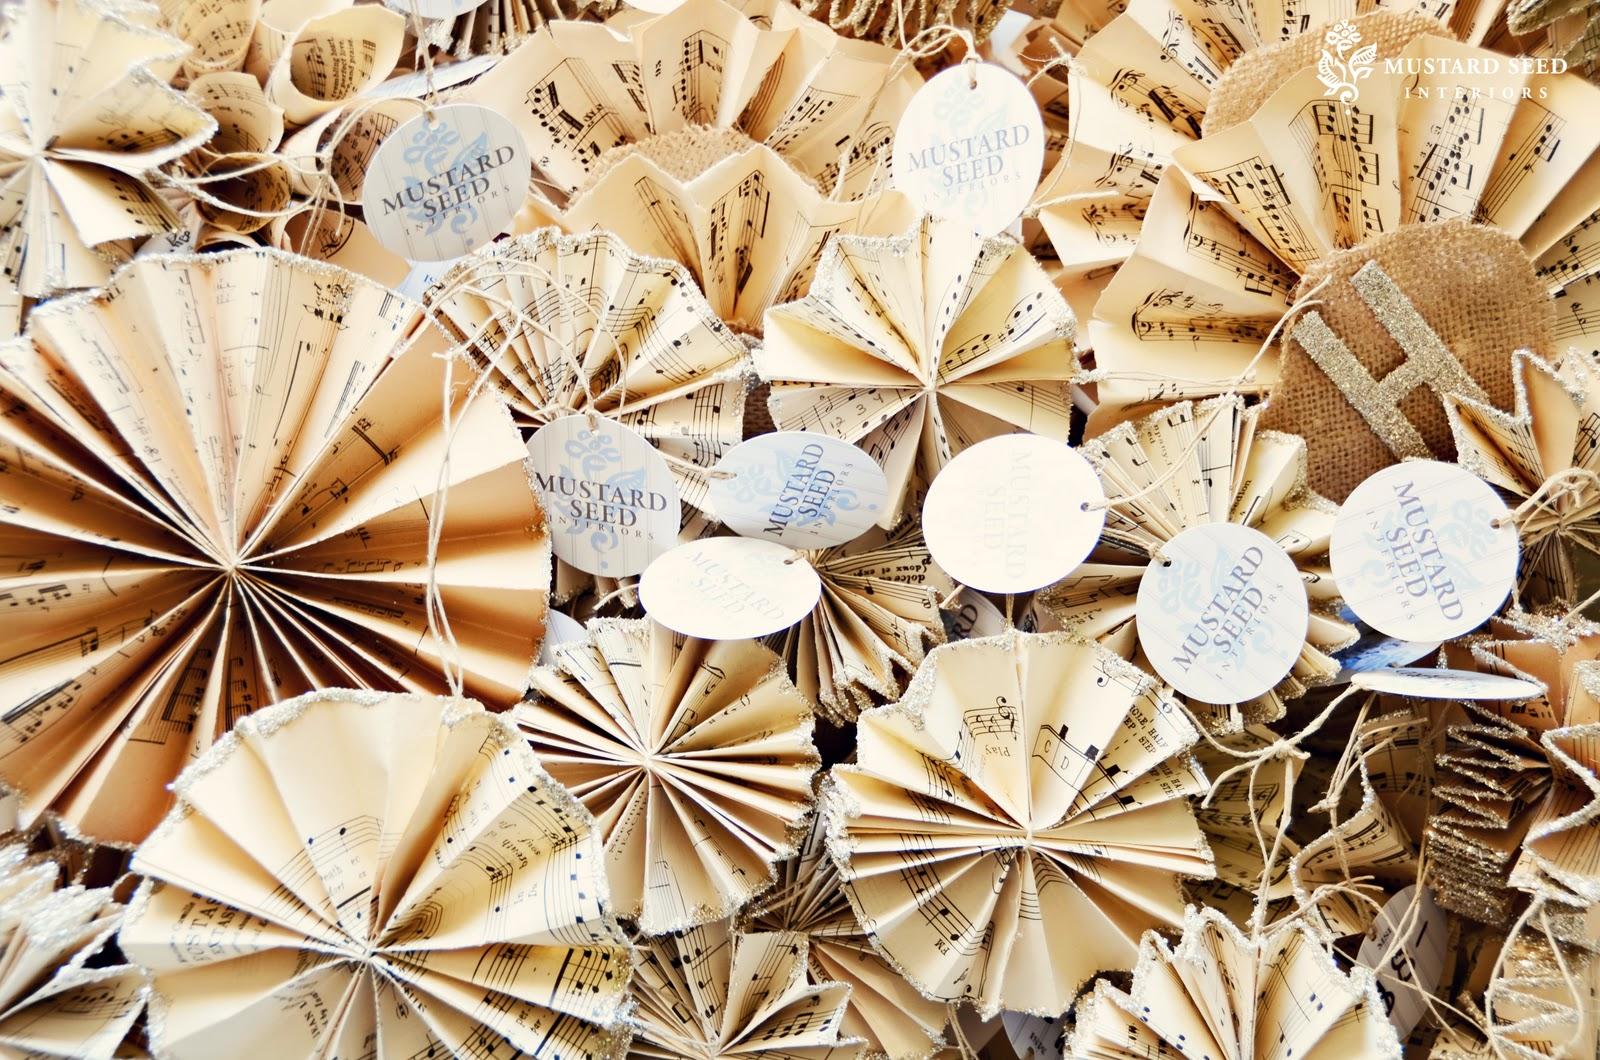 Confessions of a DIY-aholic: Antique Music Paper Ornaments